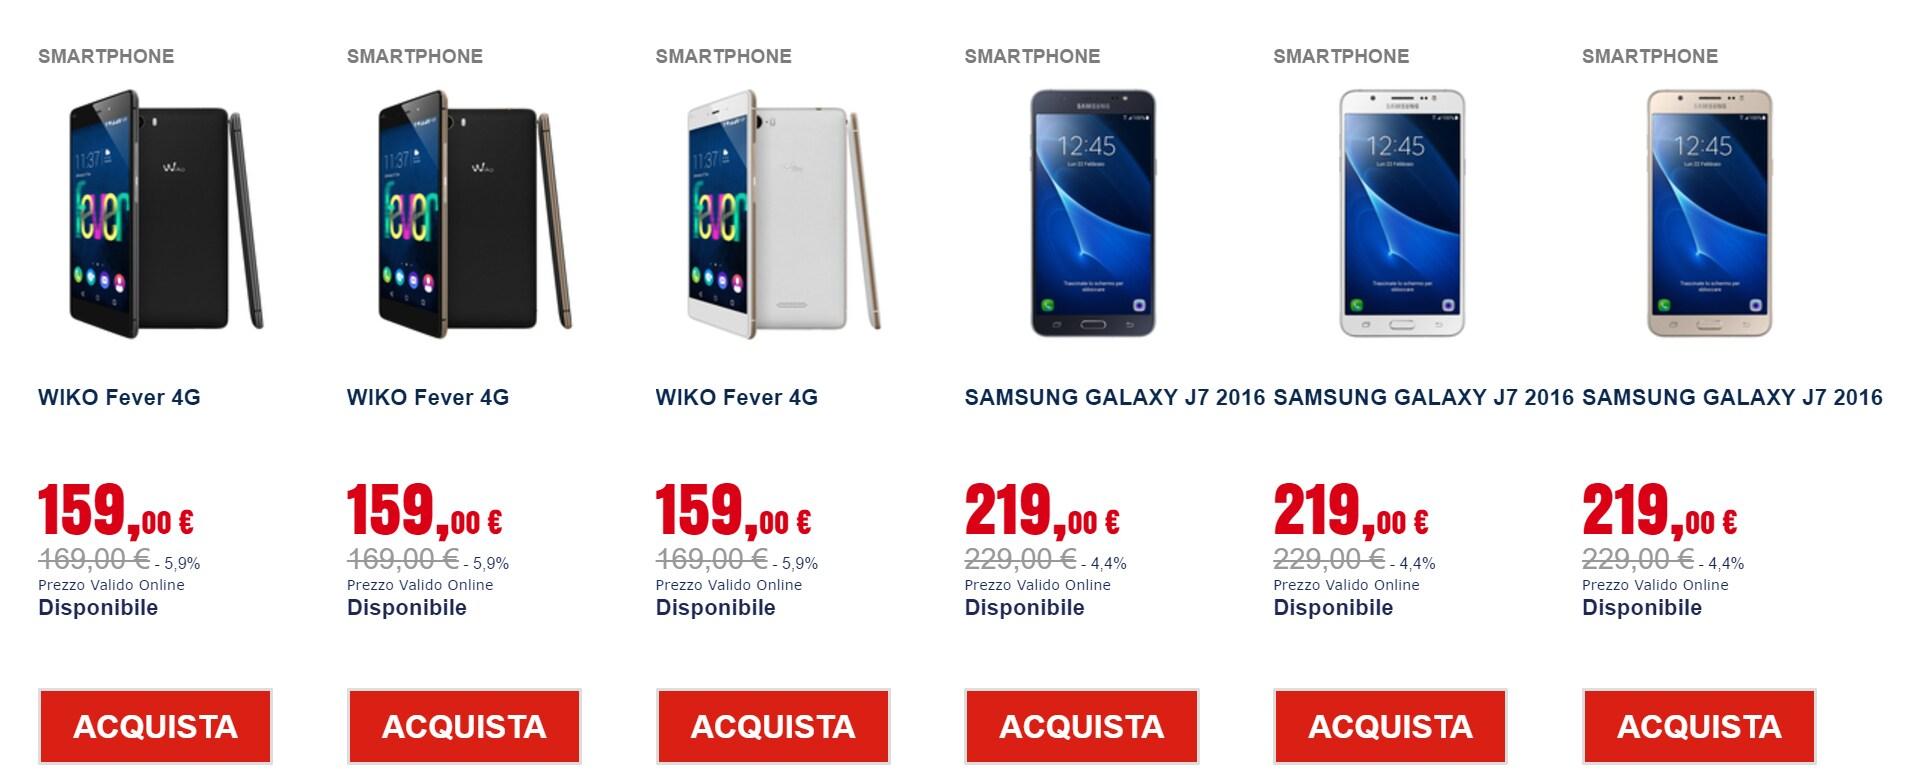 offerte trony happy price maggio 2017_smartphone (1)